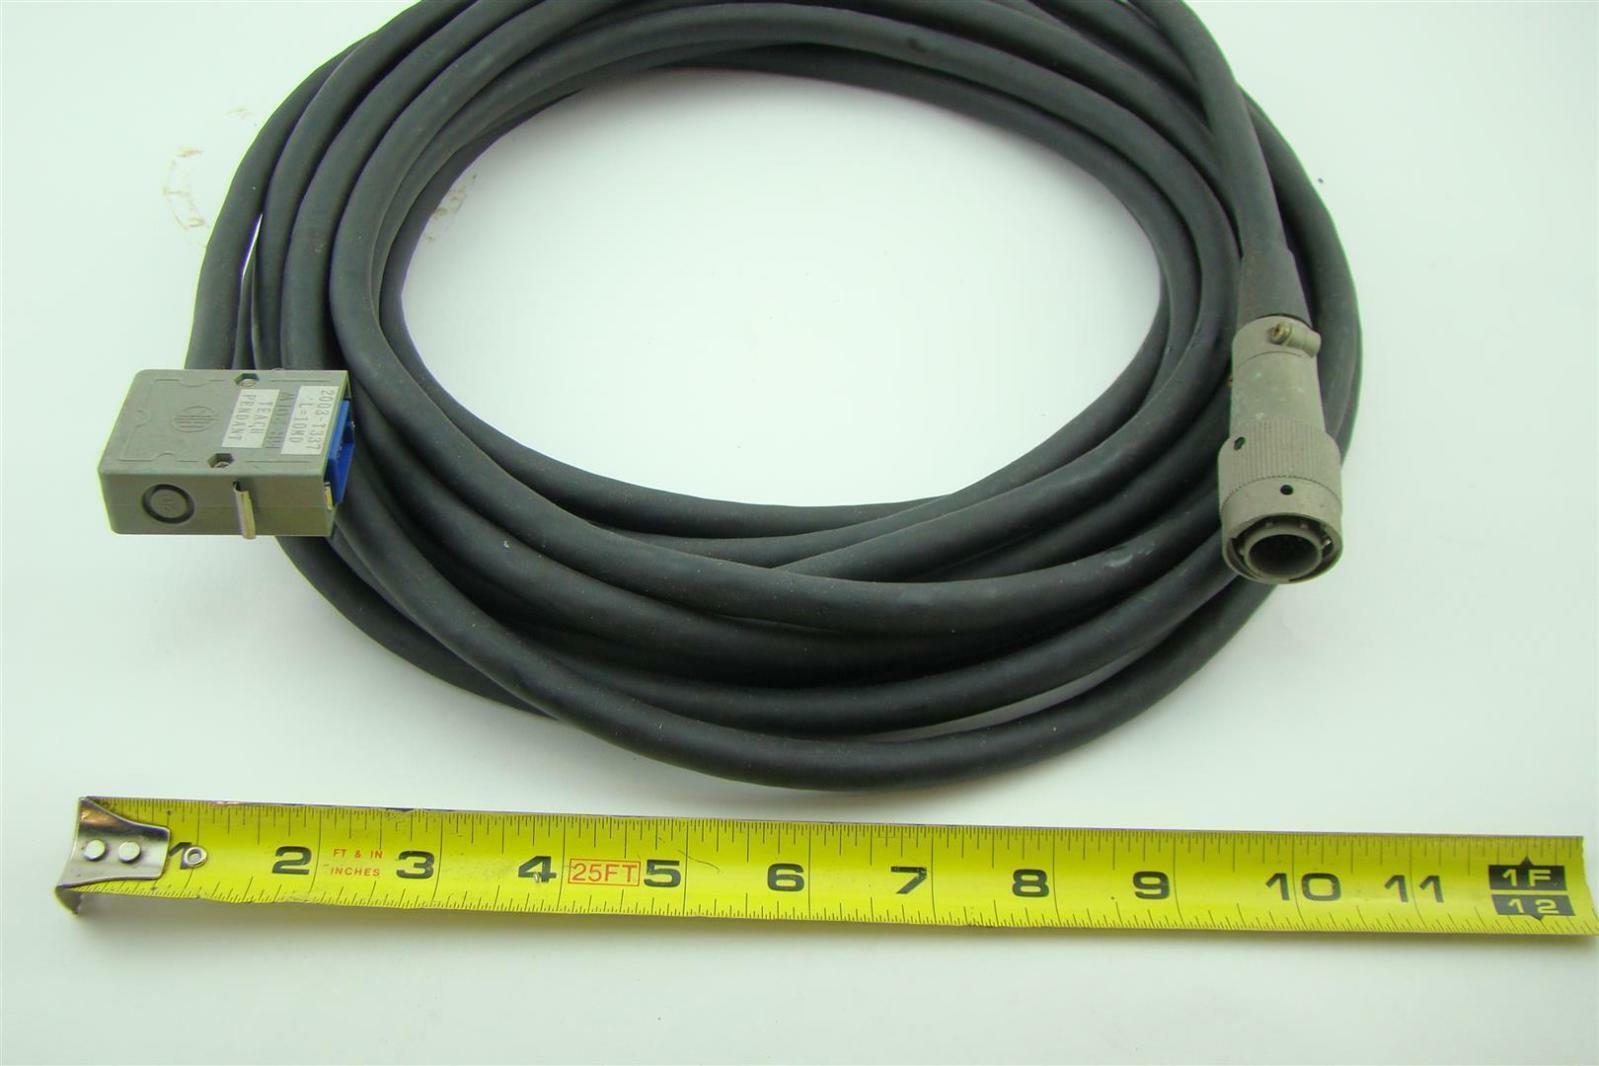 Fanuc teach pendant 10 meter cable 2003 t337 mr 20lw ebay fanuc teach pendant 10 meter cable 2003 t337 mr 20lw mozeypictures Gallery